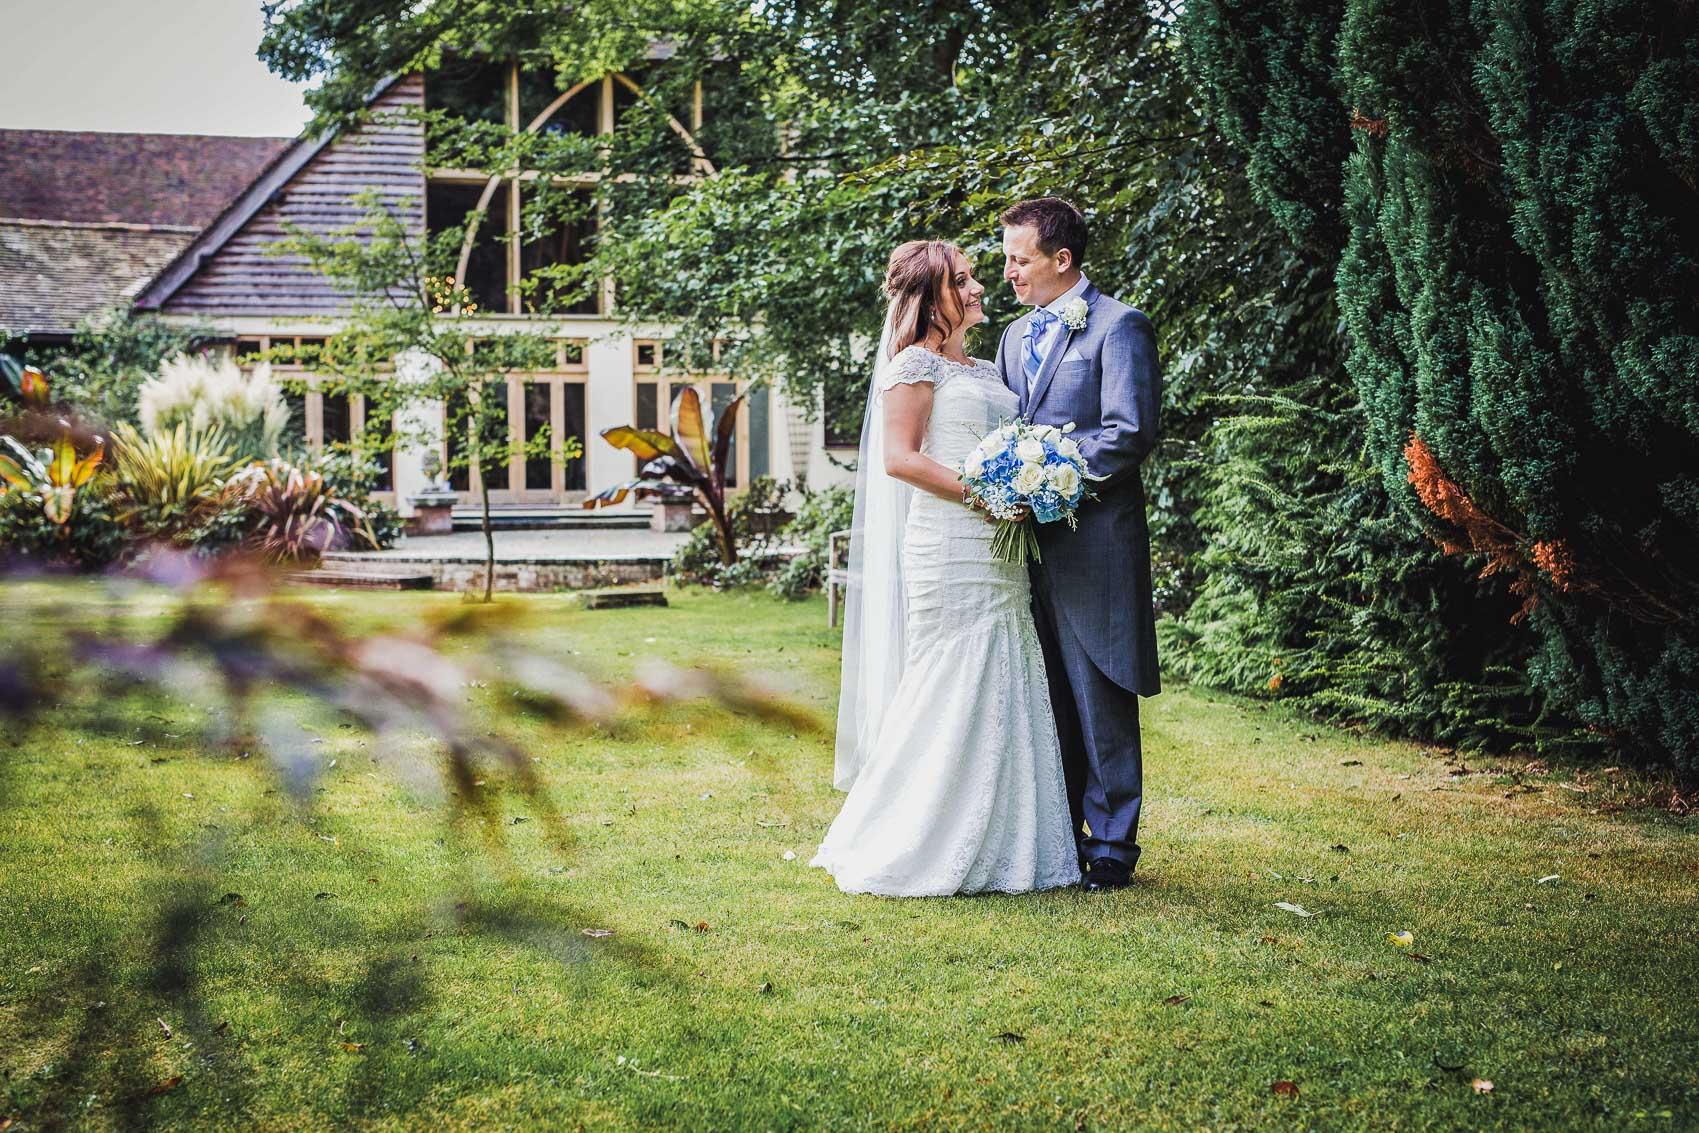 Rivervale Barn Wedding Photographer - Oli and Leyla 31